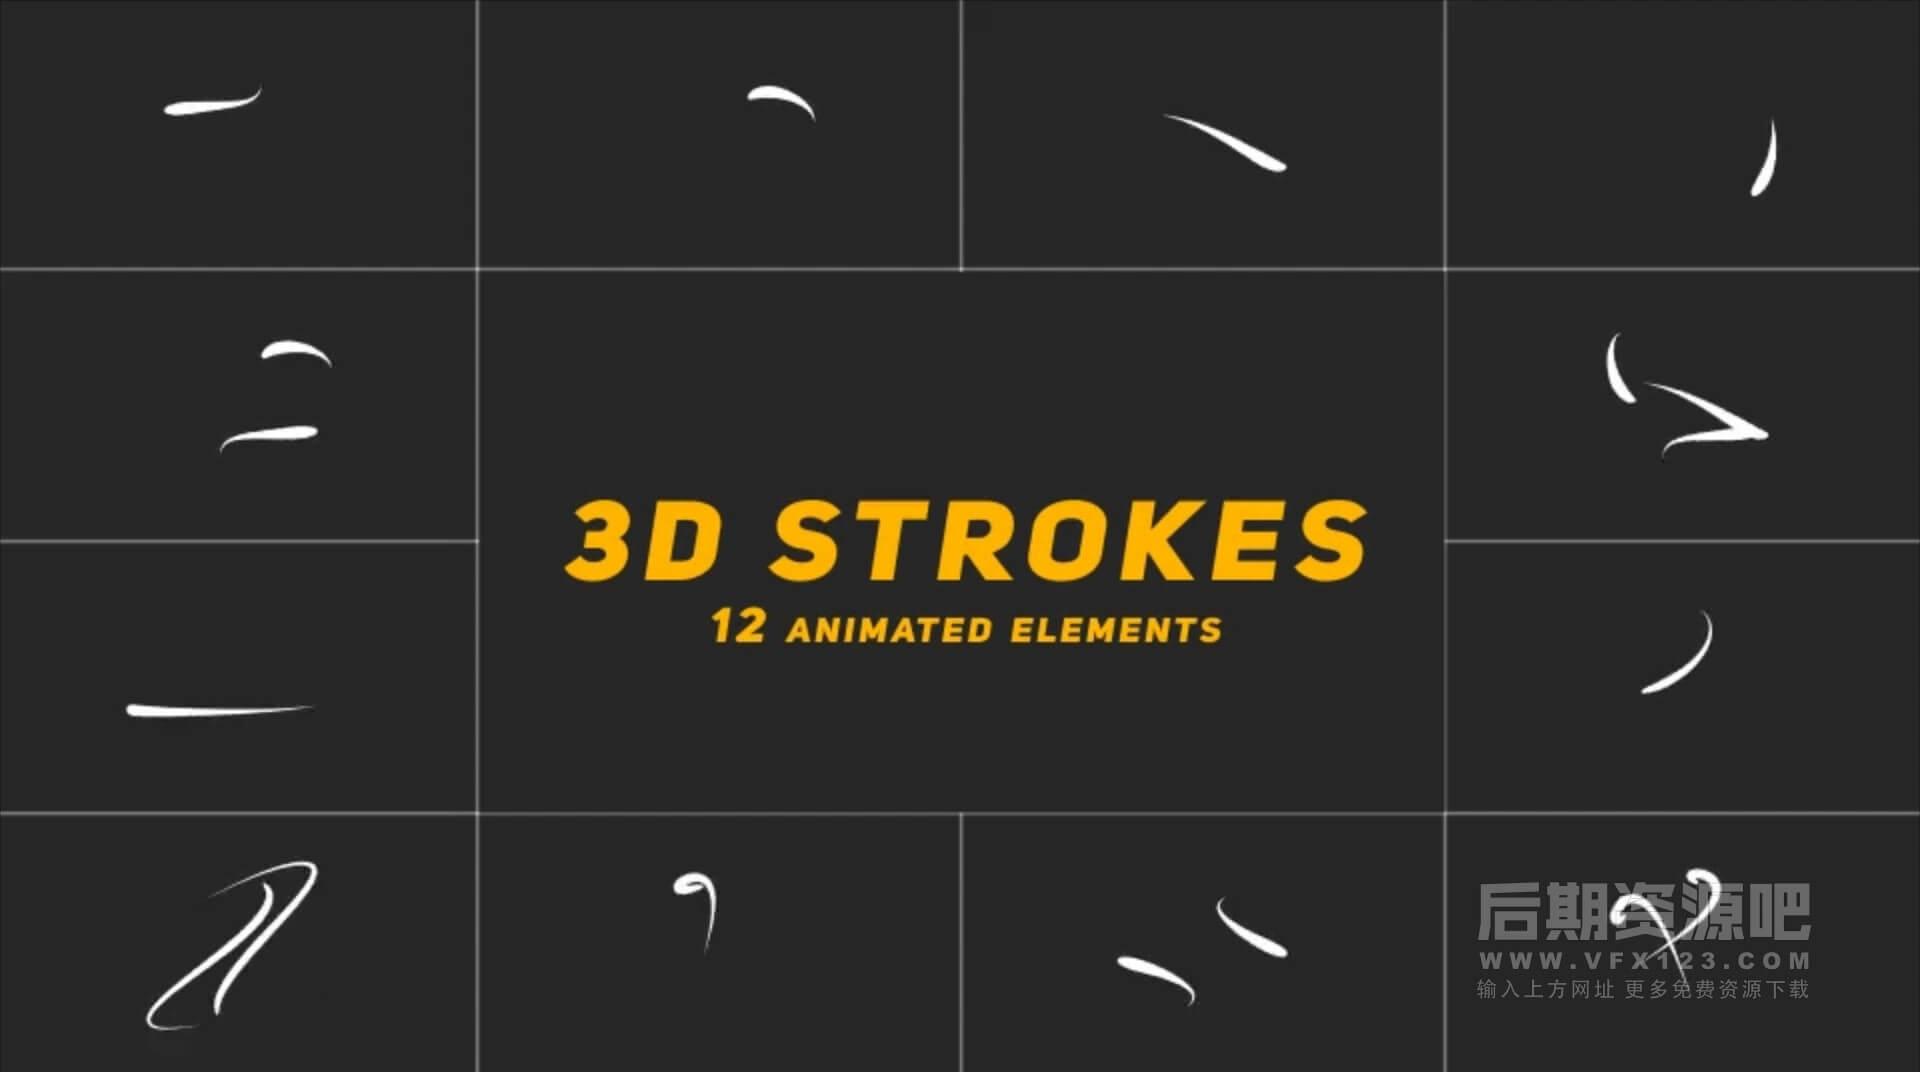 视频素材 144个几何形状MG动画元素 带通道 Animated Elements Shapes